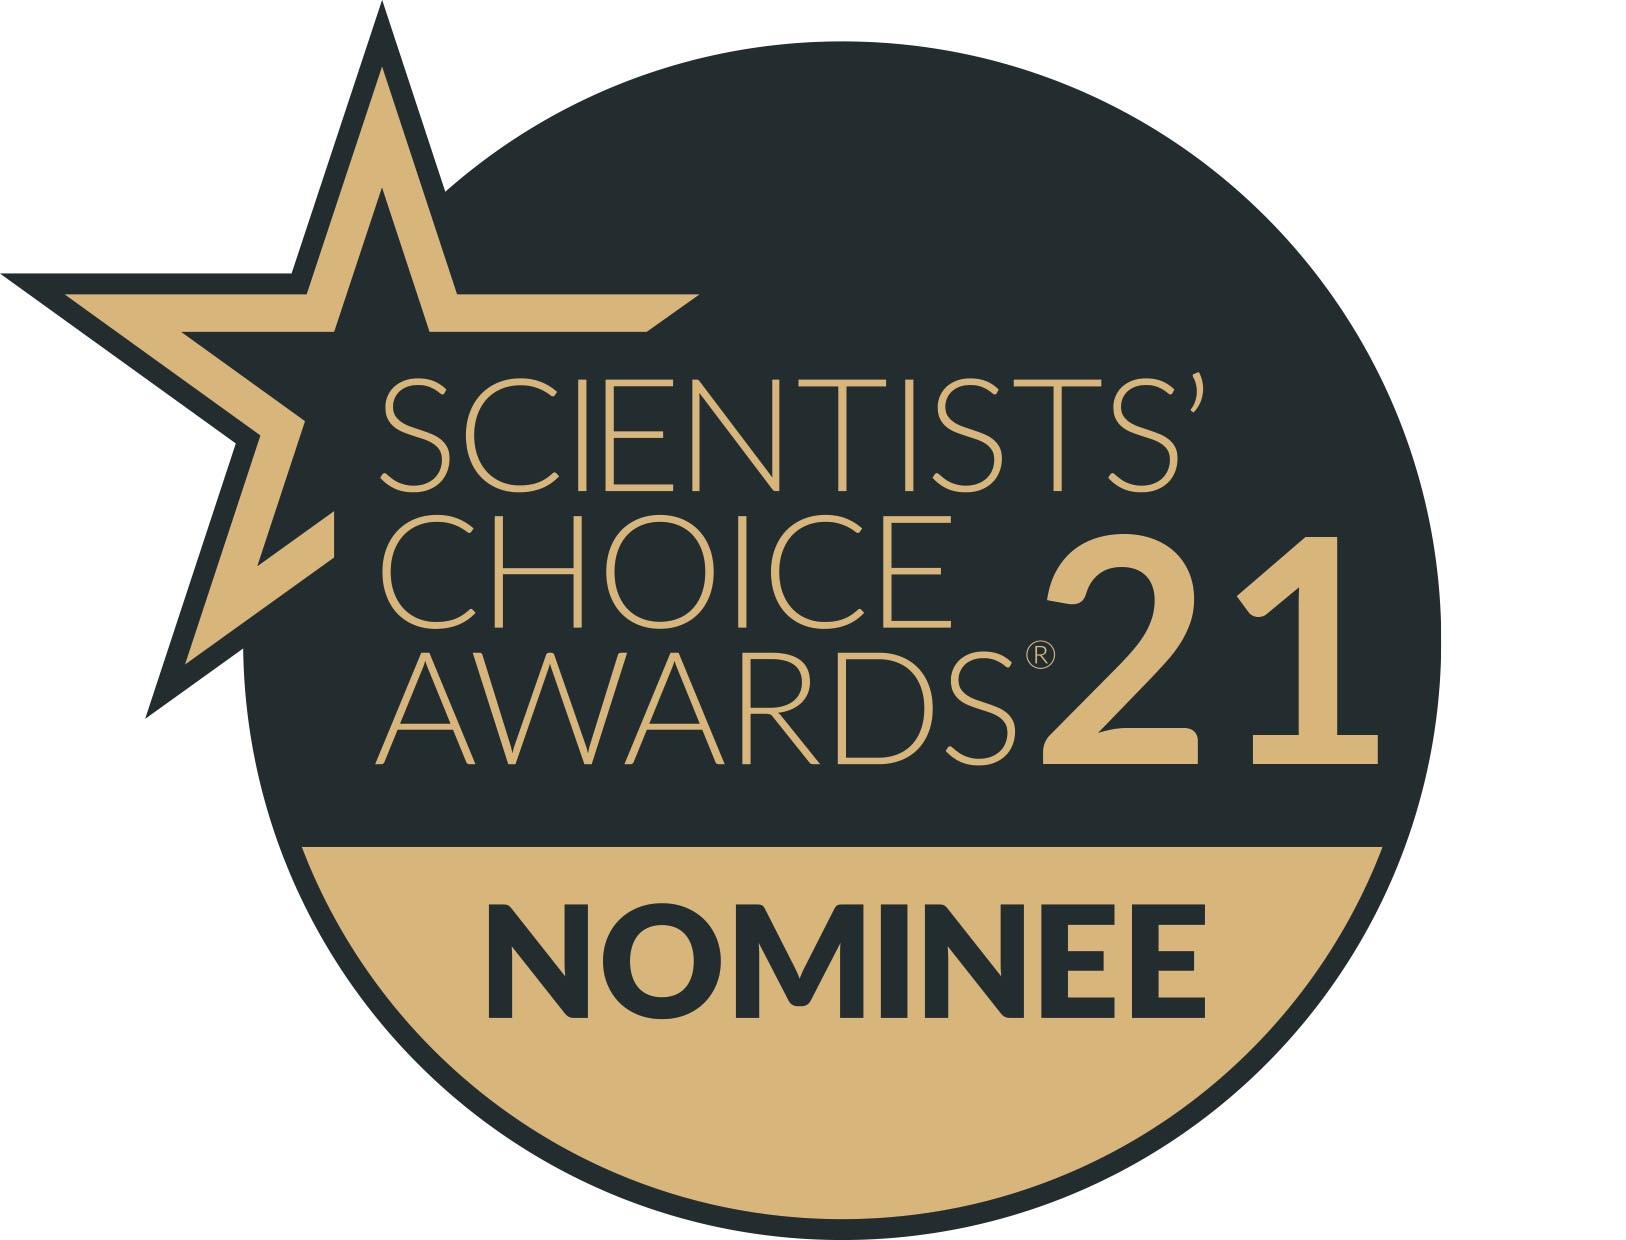 CytoSMART Lux3 FL-Scientists Choice Awads 2021-Nominee